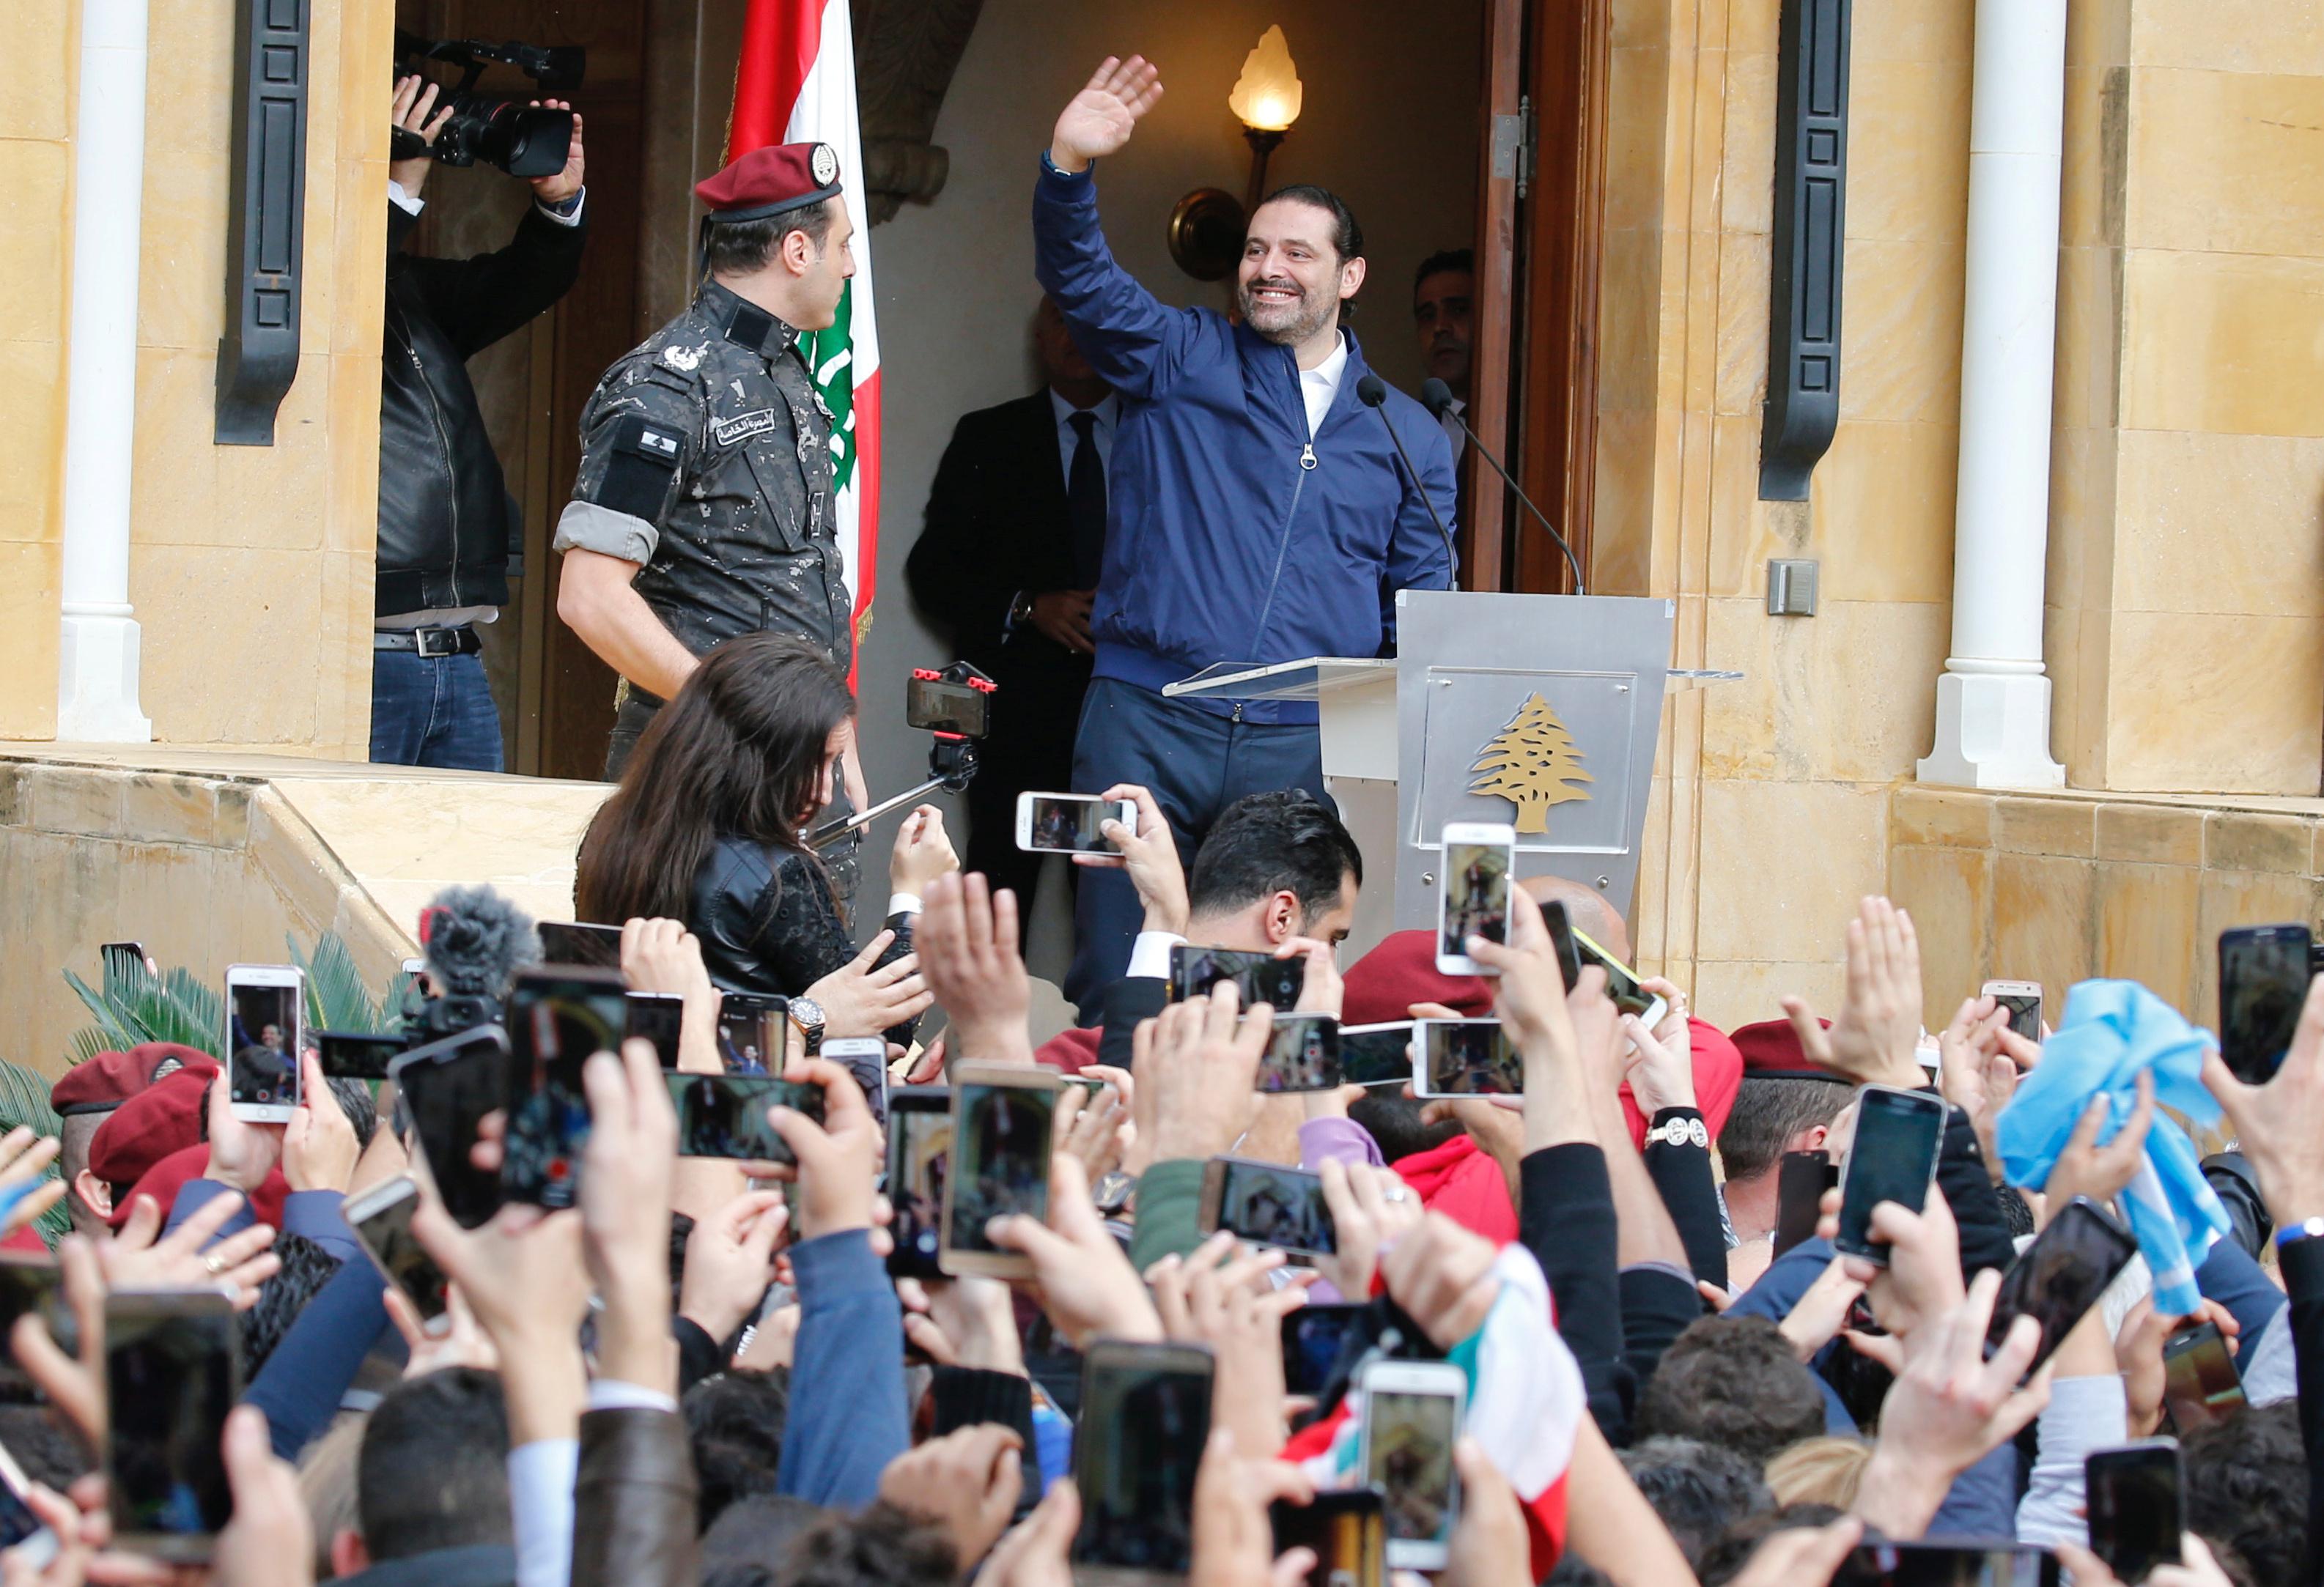 2017 11 22T125014Z 1949669245 RC1616AFF000 RTRMADP 3 LEBANON POLITICS